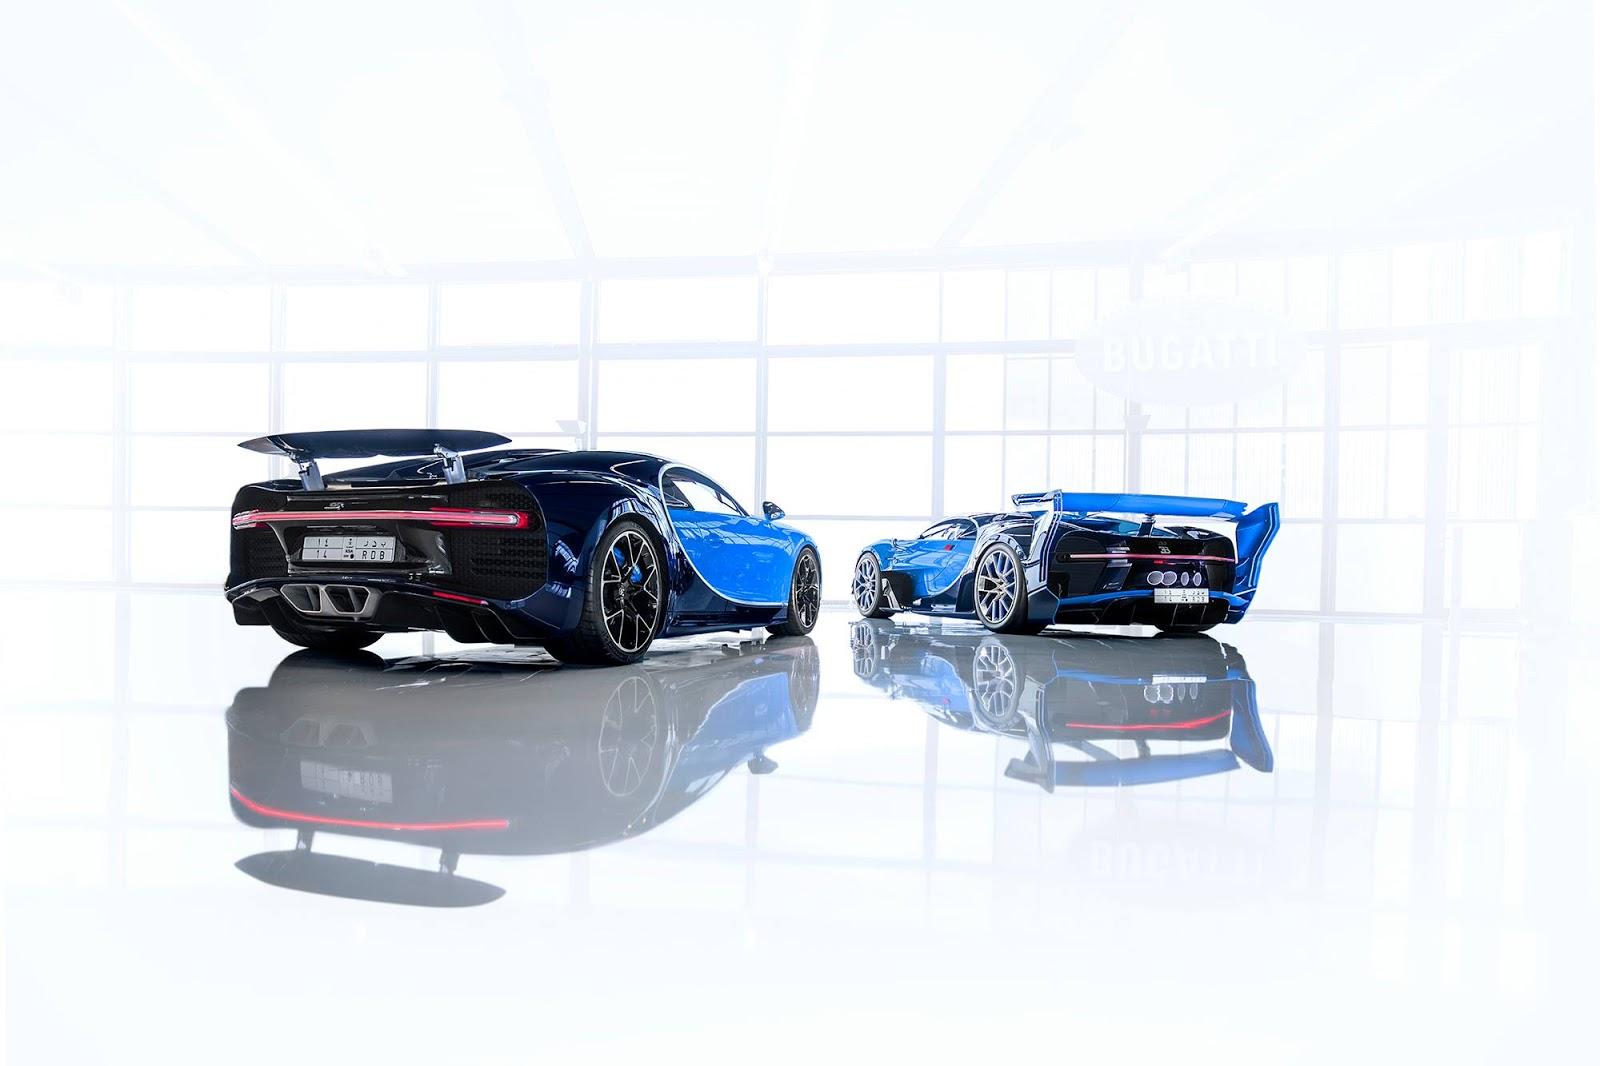 Bugatti Chiron Show Car And Vision GT Concept (7)